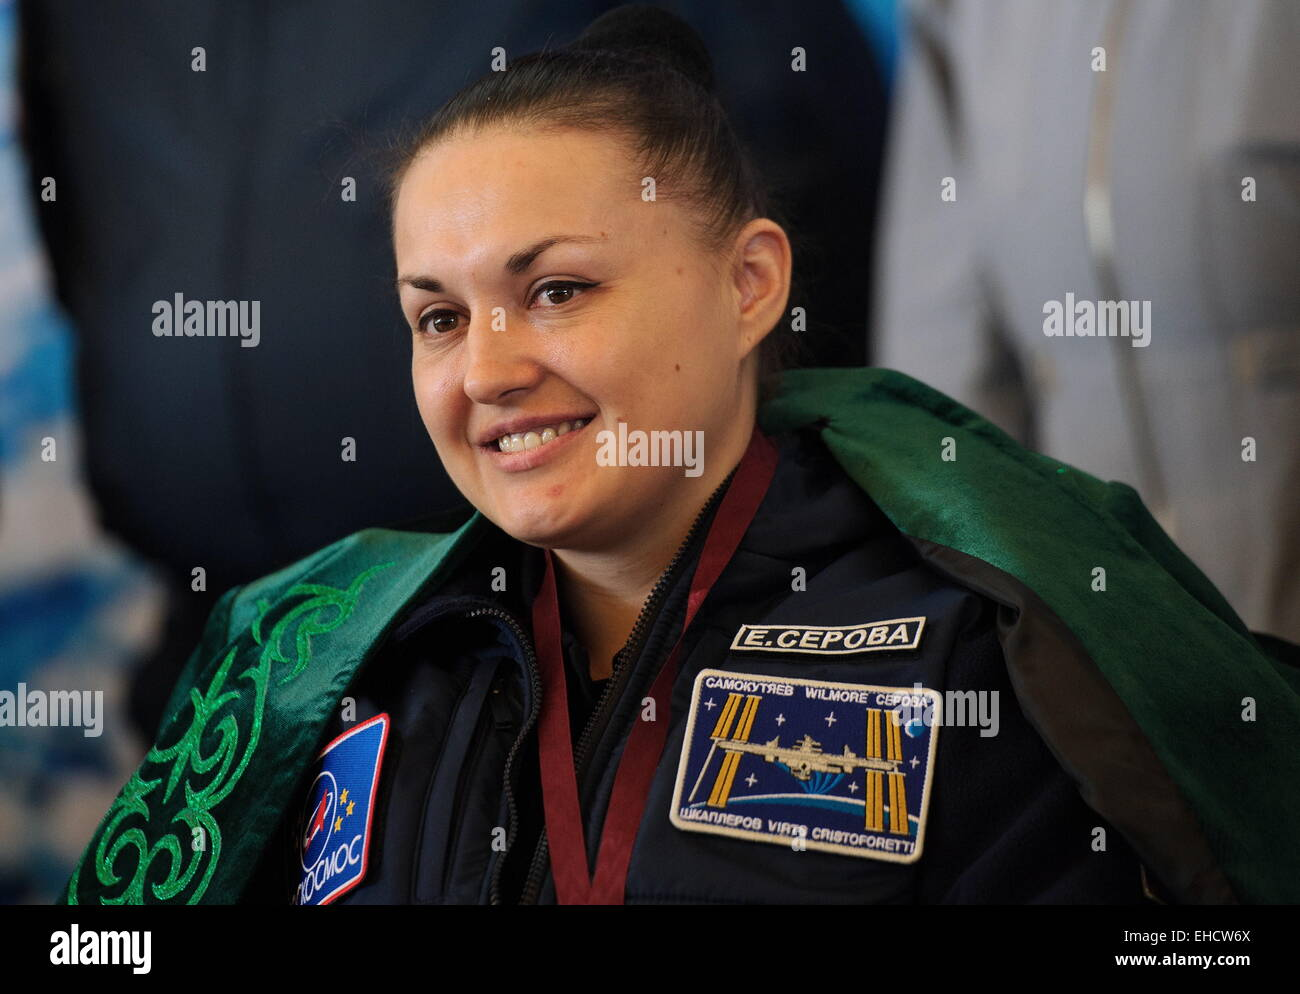 Qaraghandy, Kazakhstan. 12th Mar, 2015. Soyuz TMA-14M spacecraft crew member, Russia's cosmonaut Yelena Serova - Stock Image